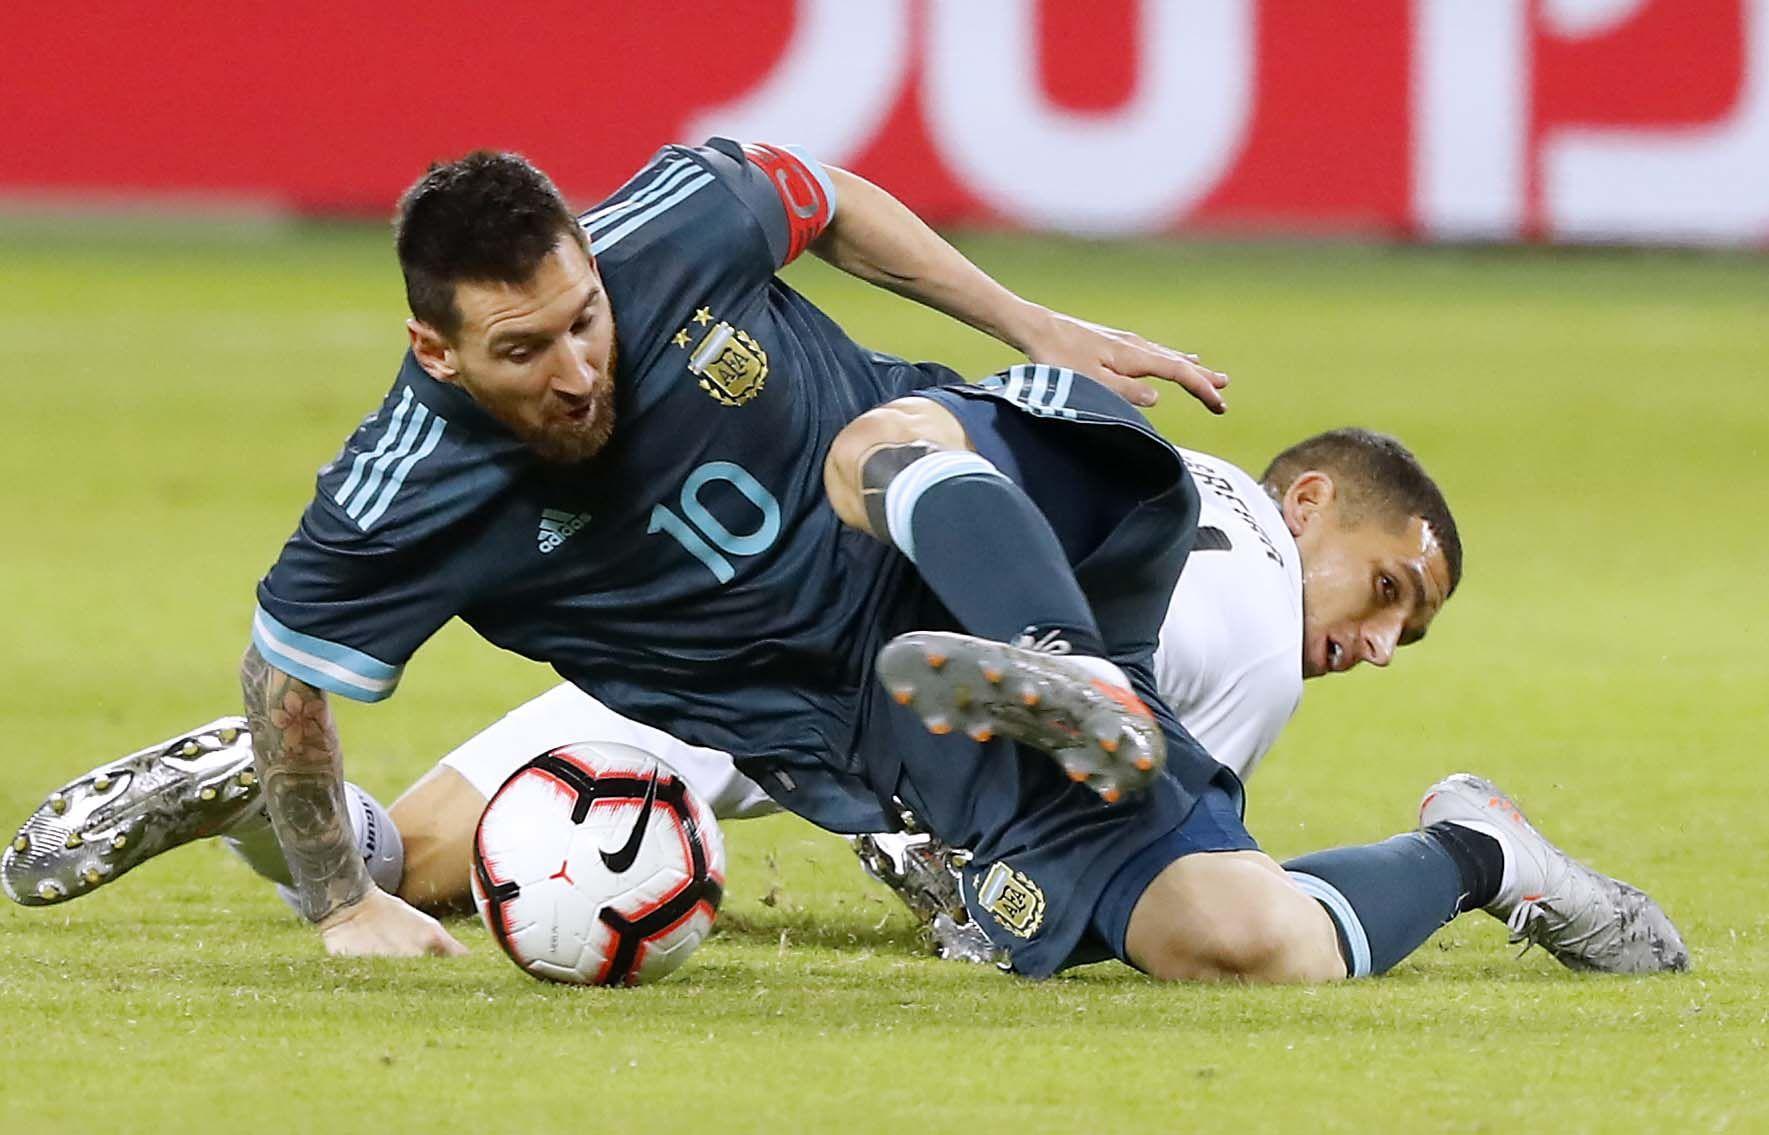 Con un gol de Messi sobre el final, Argentina empató con Uruguay